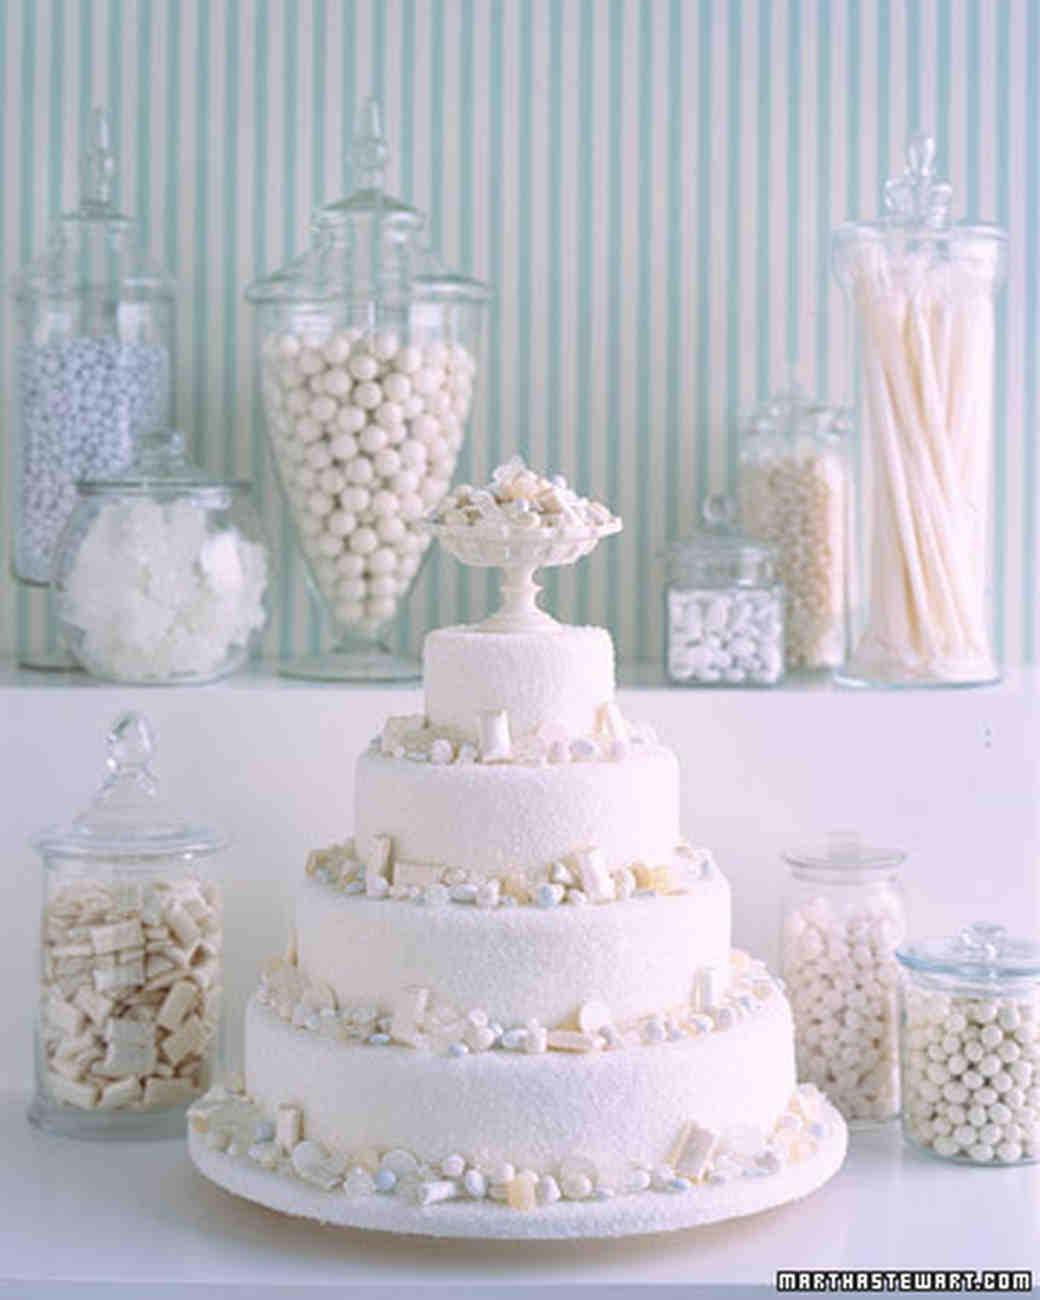 White Candy Windfall Cake